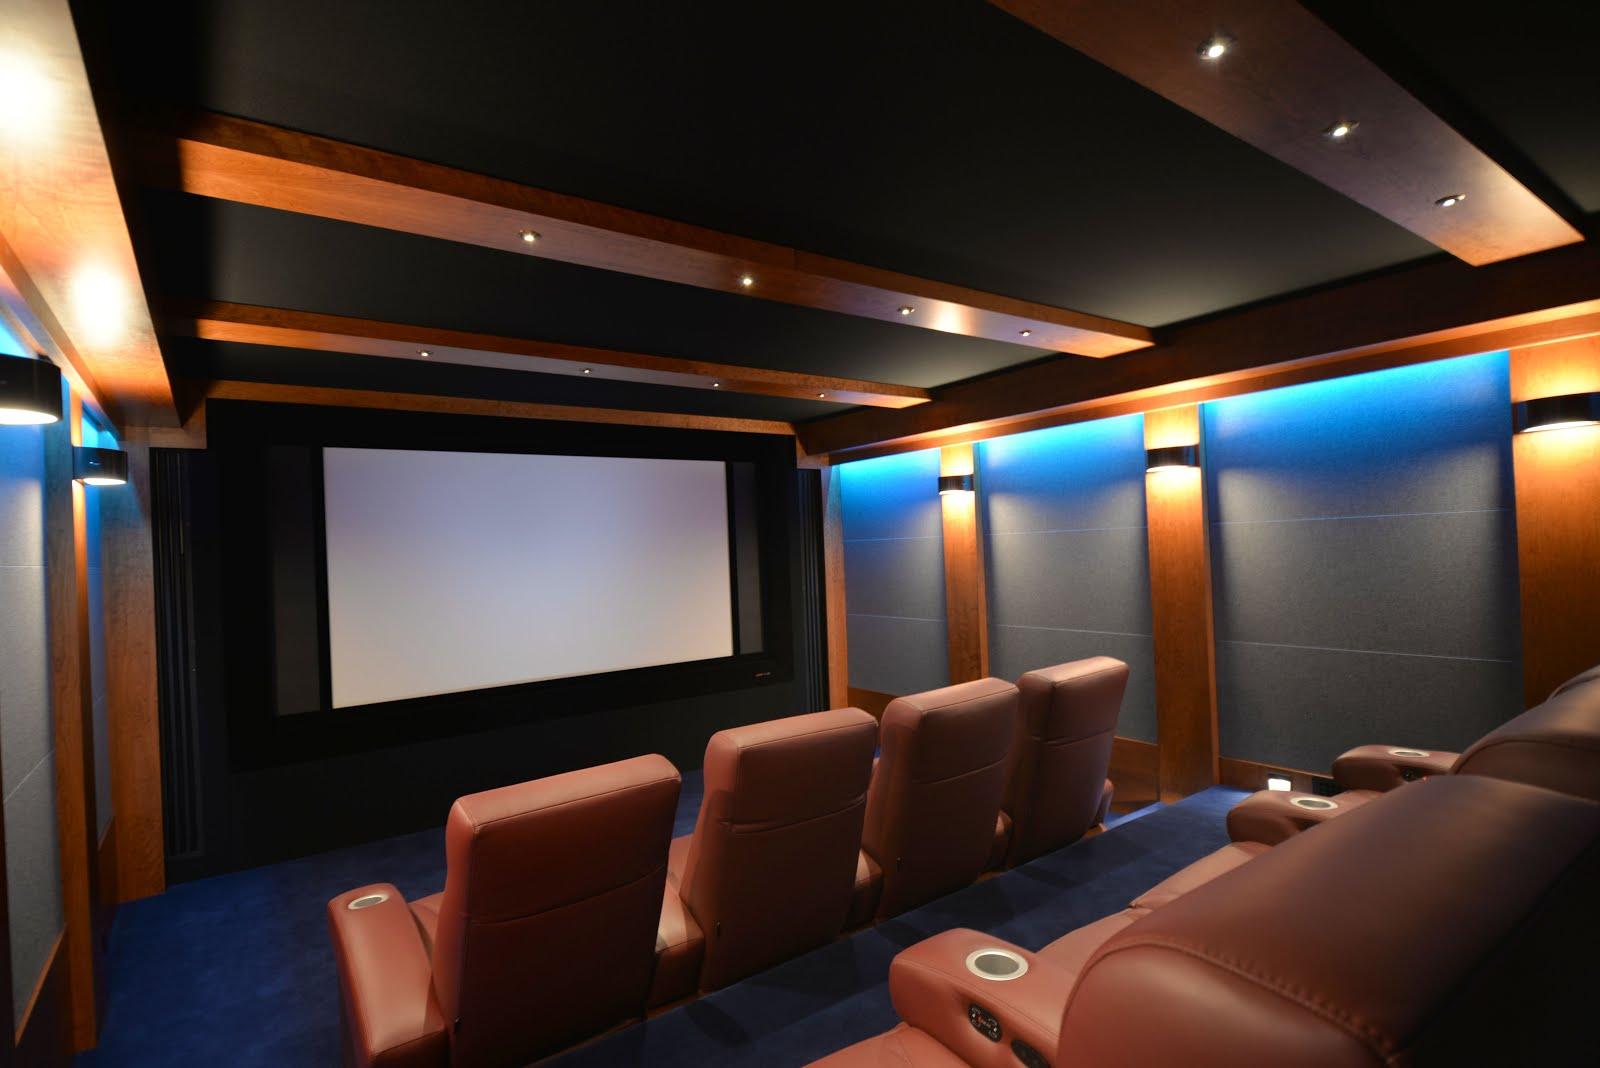 Modern Luxe Home Cinema in Nantucket